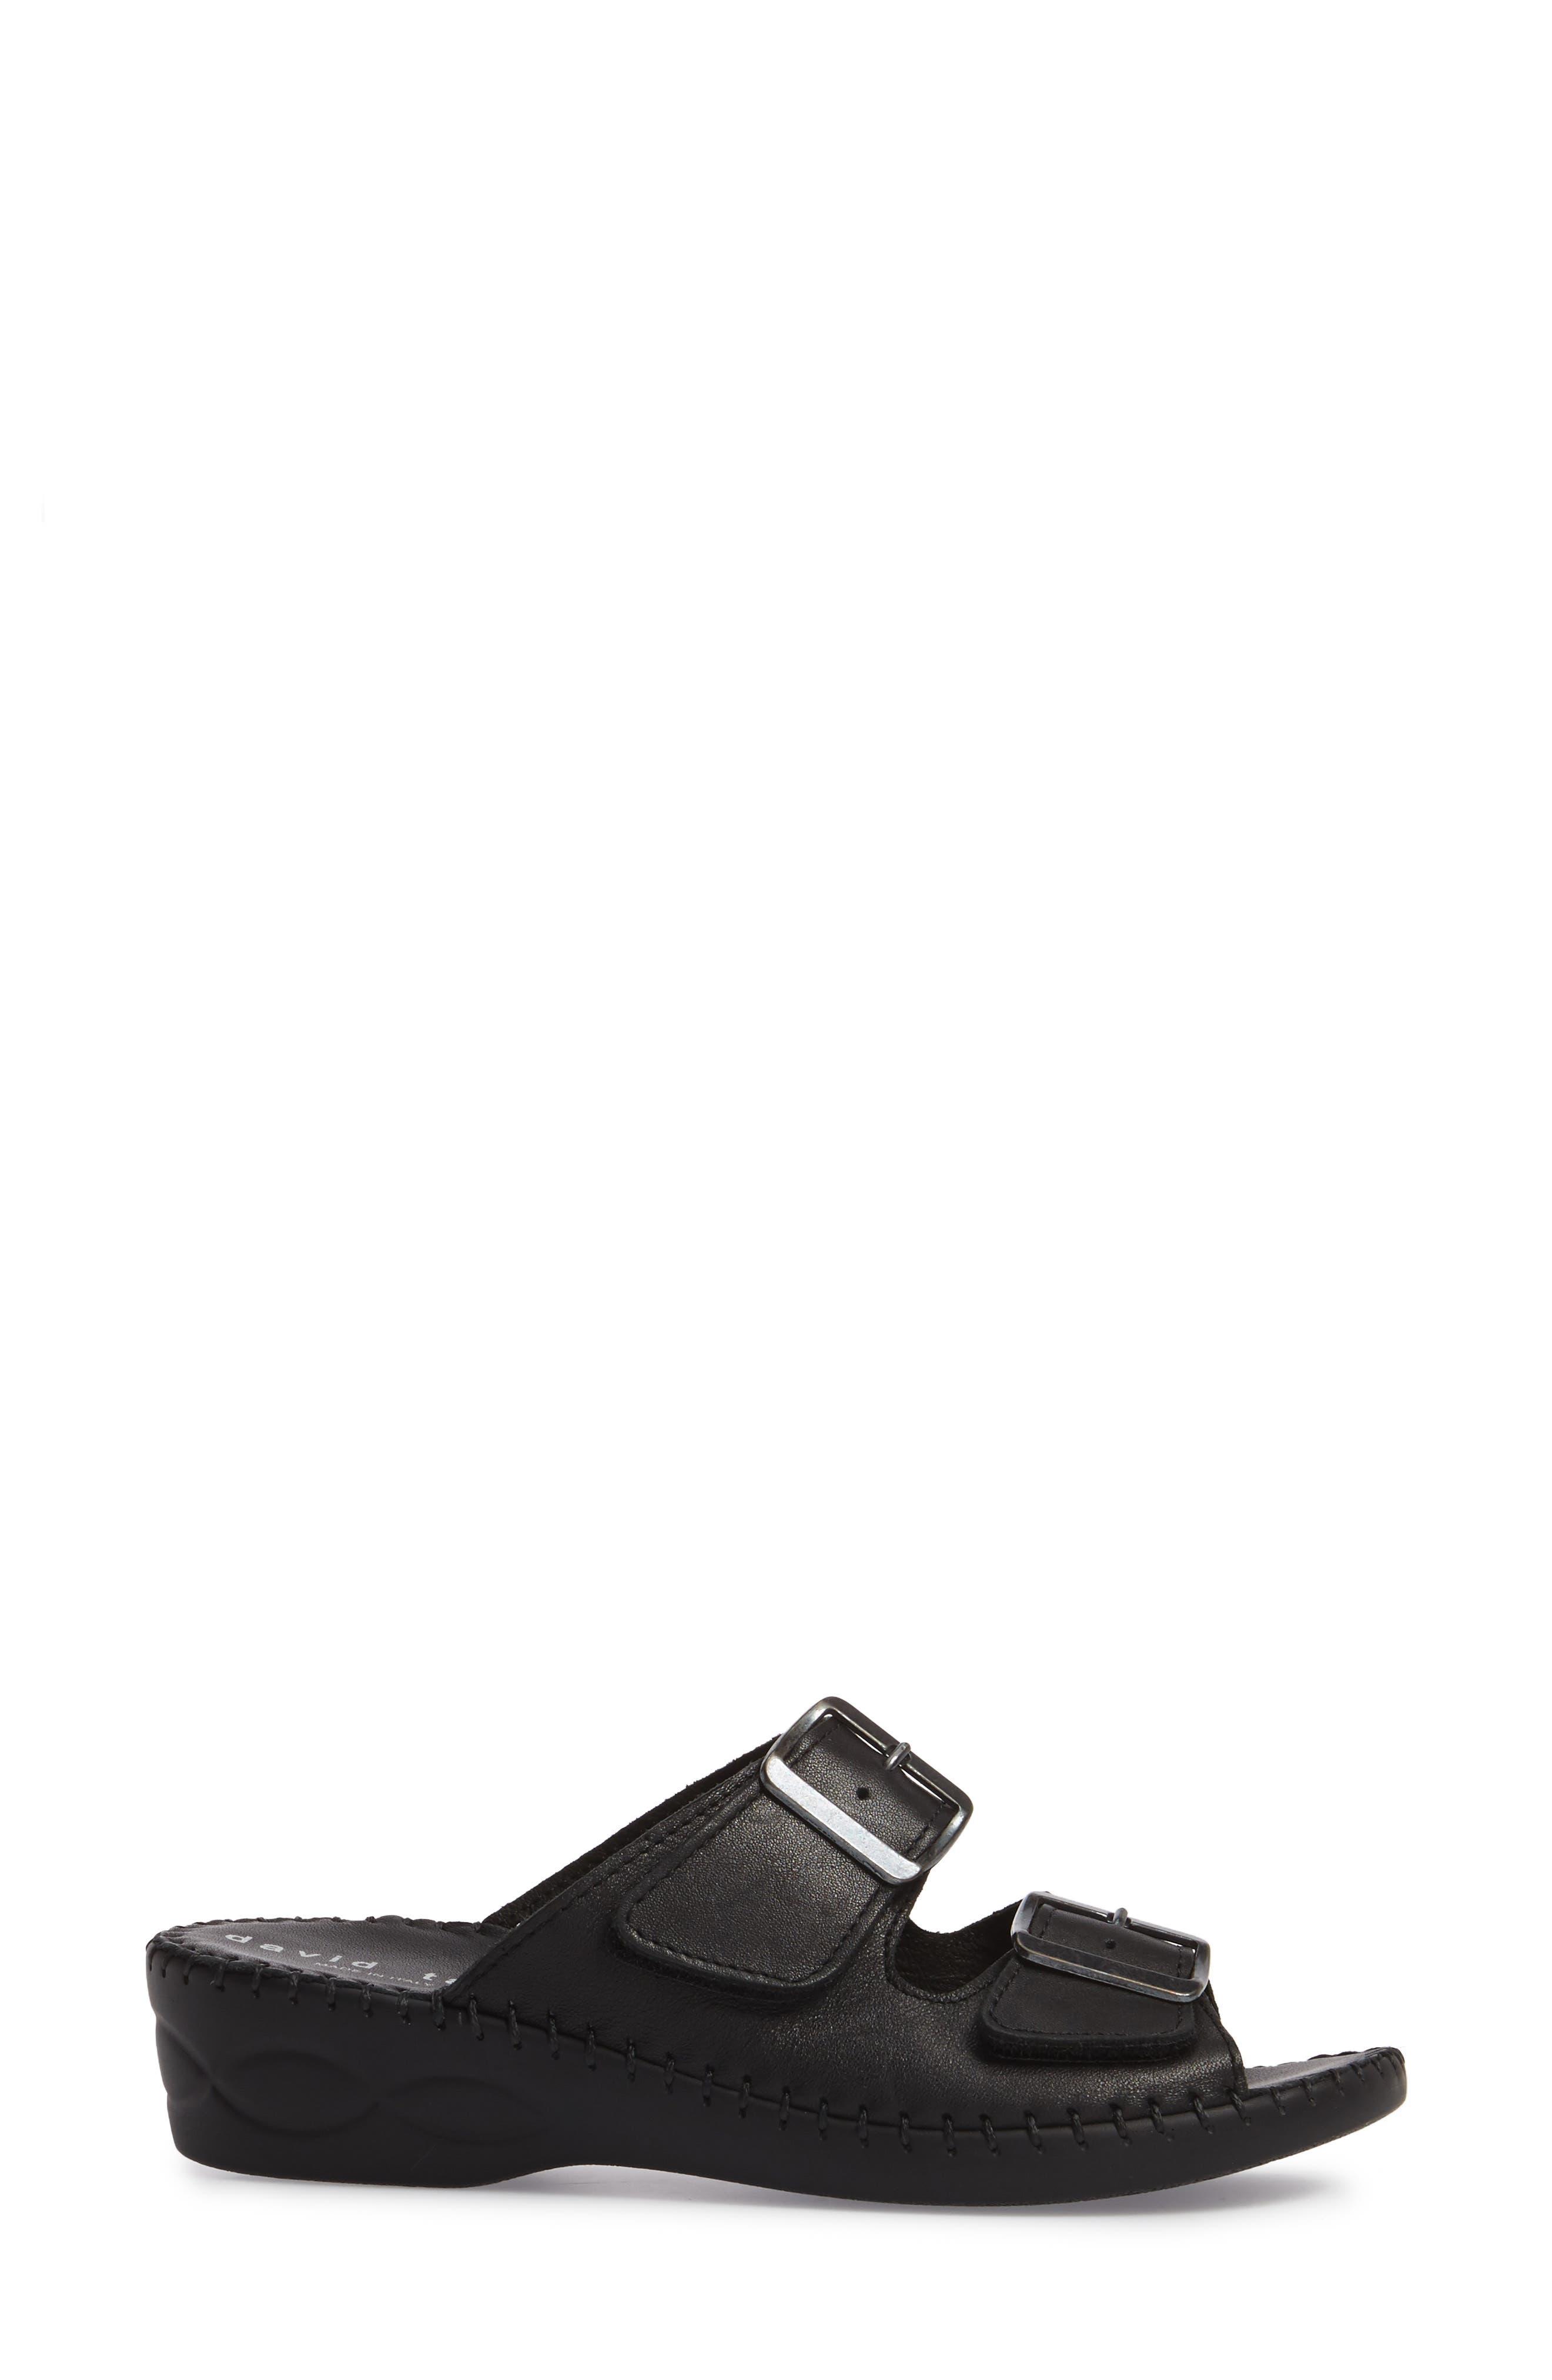 Sol Sandal,                             Alternate thumbnail 3, color,                             Black Leather